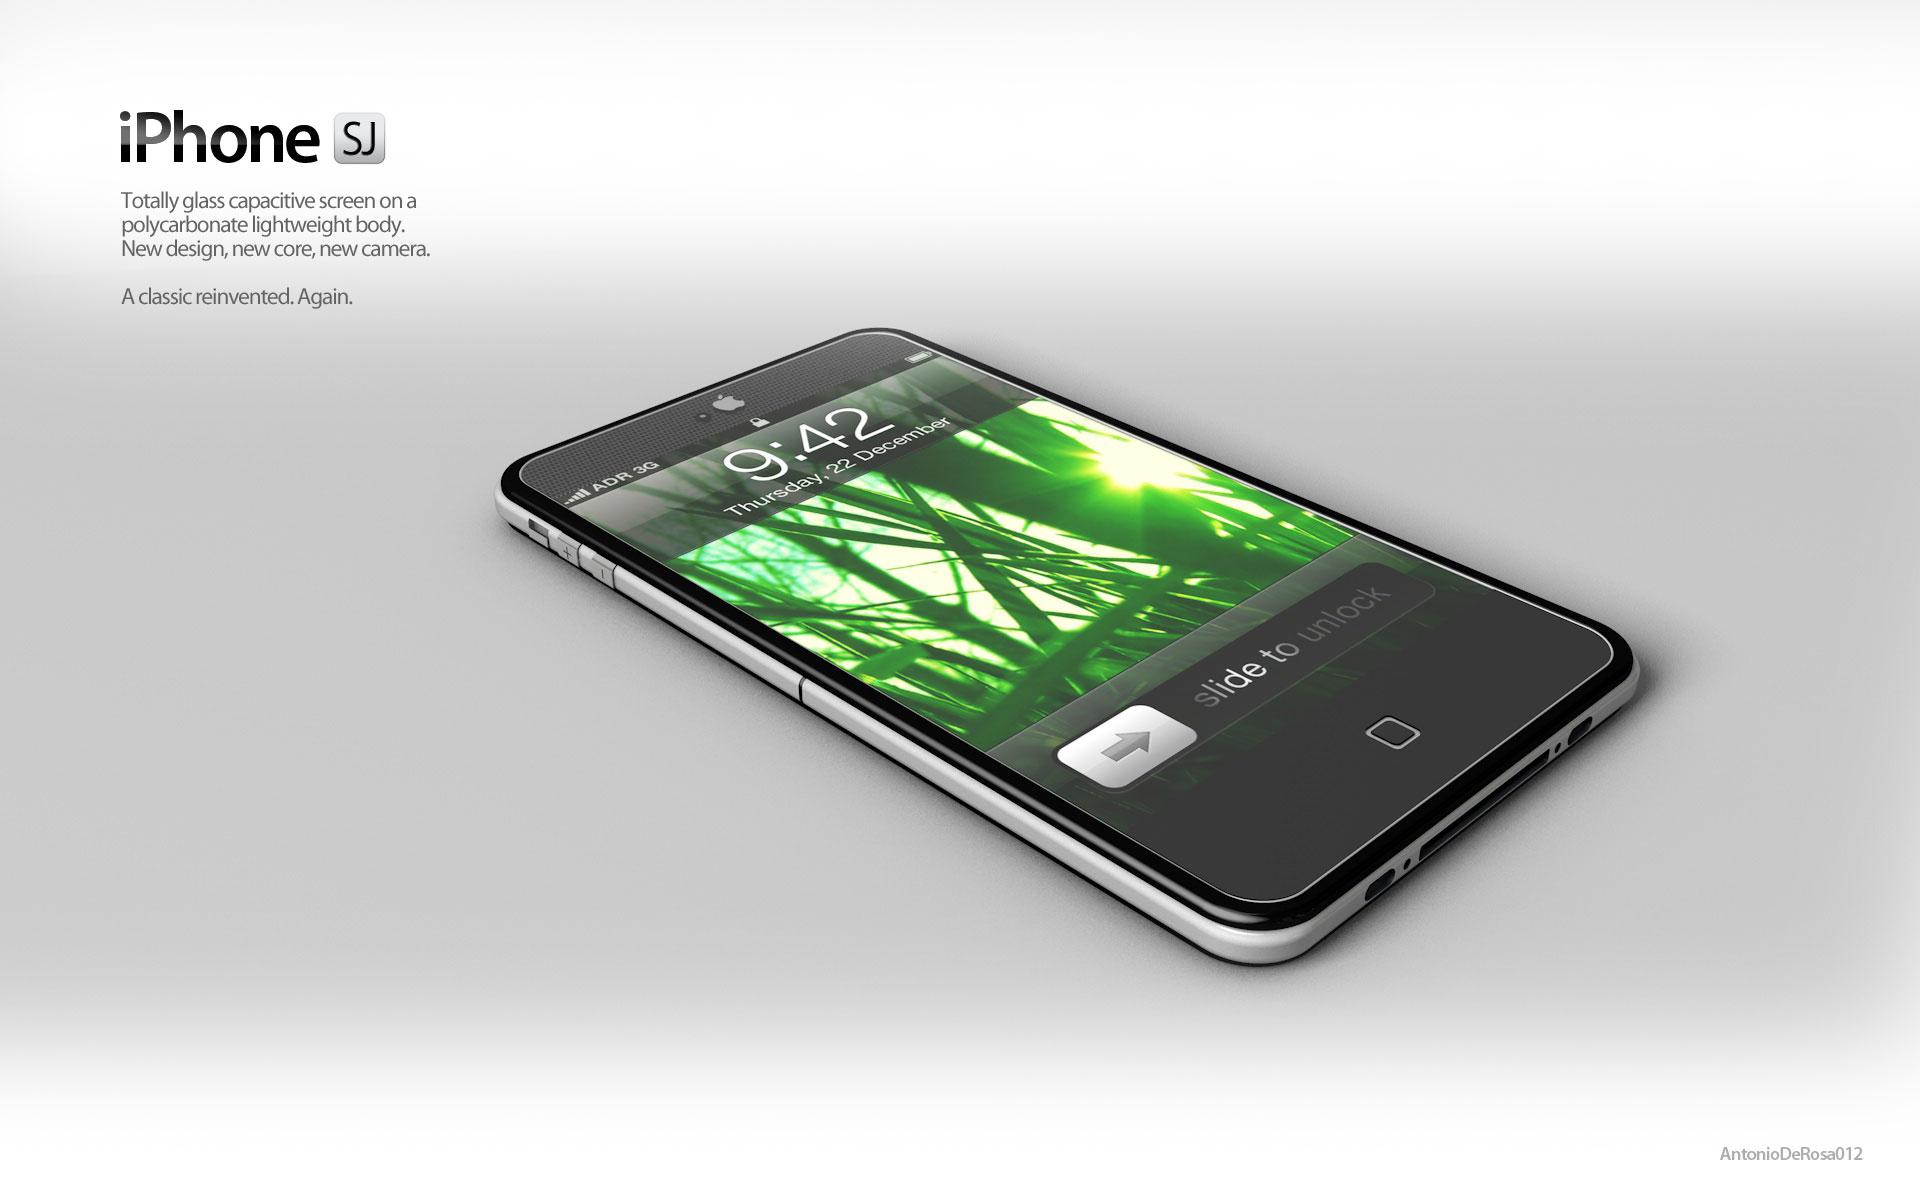 iPhone 5 / 6 / SJ